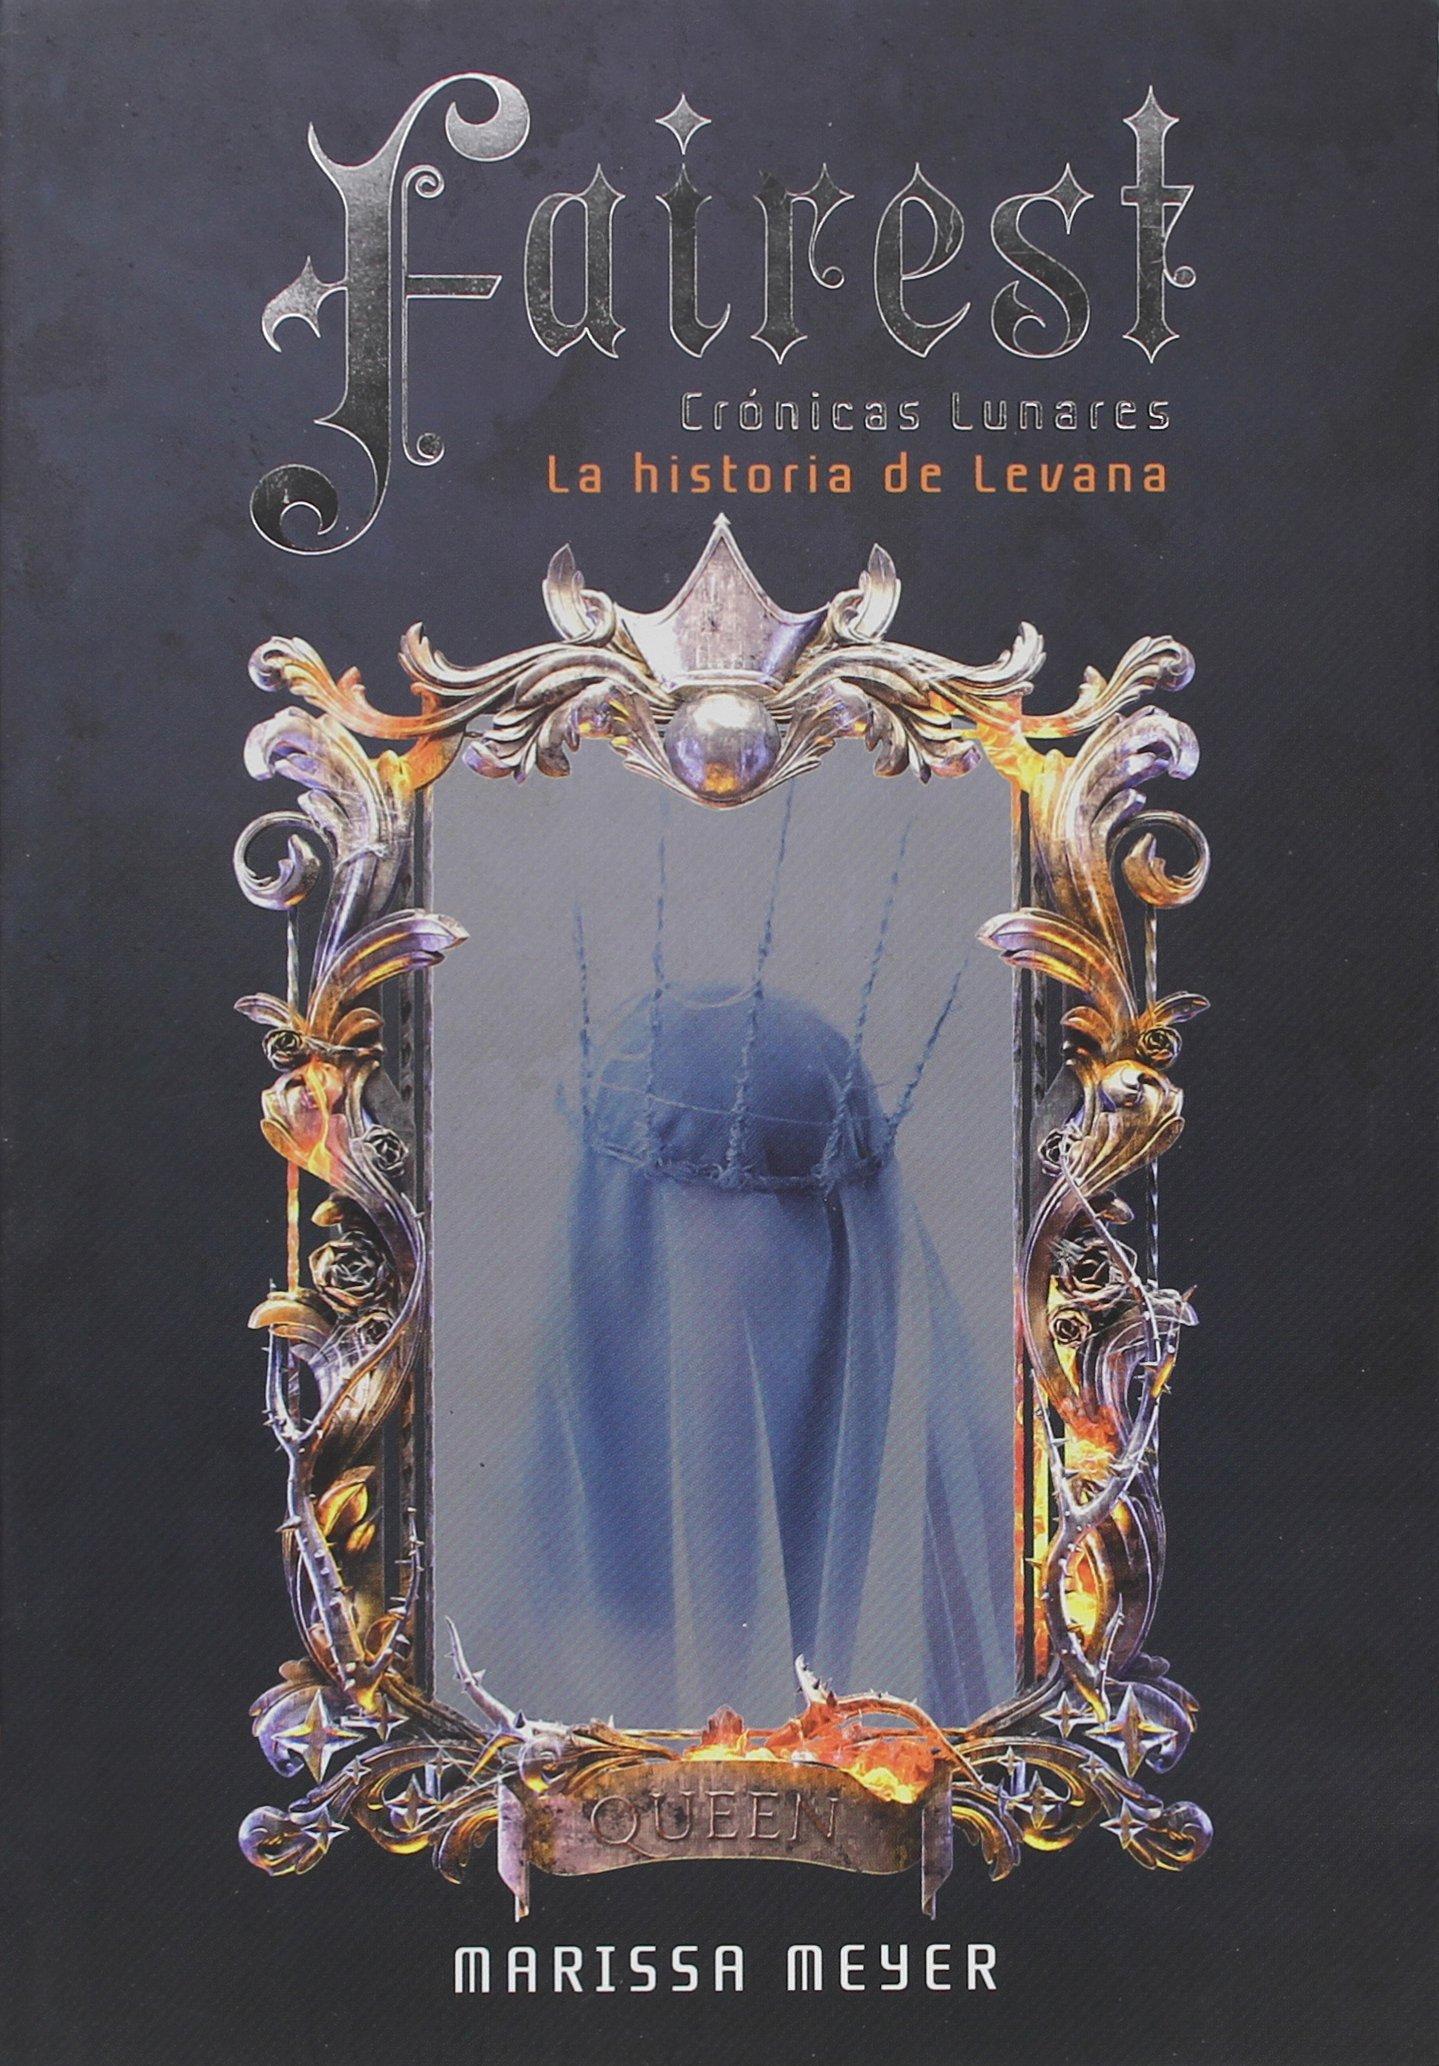 winter cronicas lunares castellano